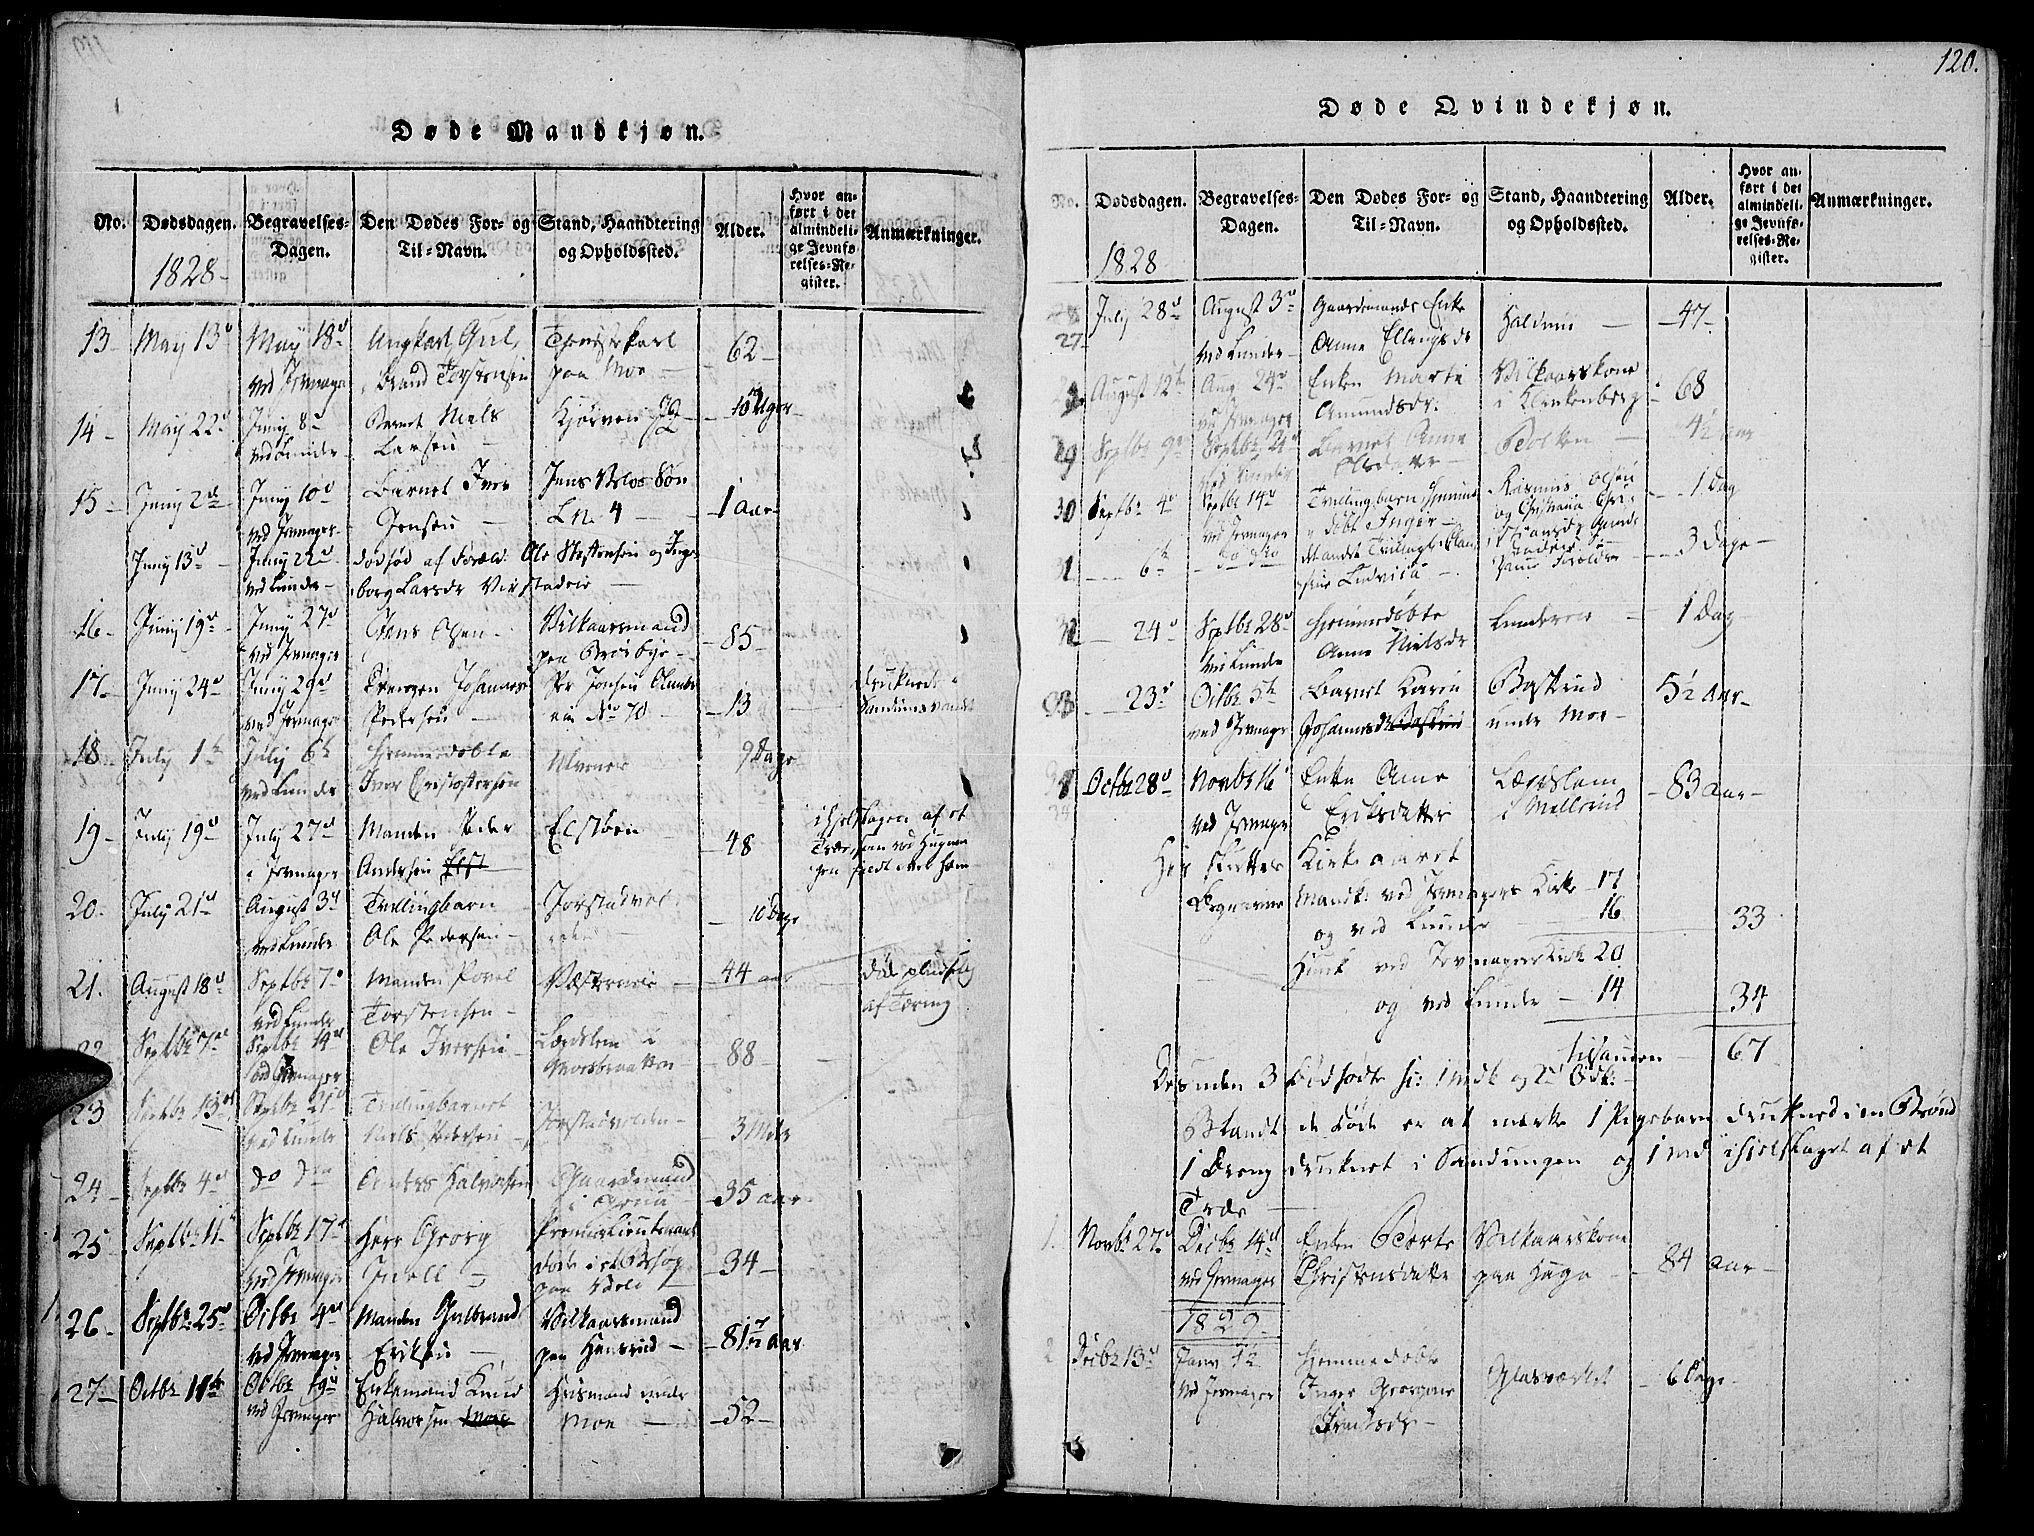 SAH, Jevnaker prestekontor, Ministerialbok nr. 5, 1815-1837, s. 120